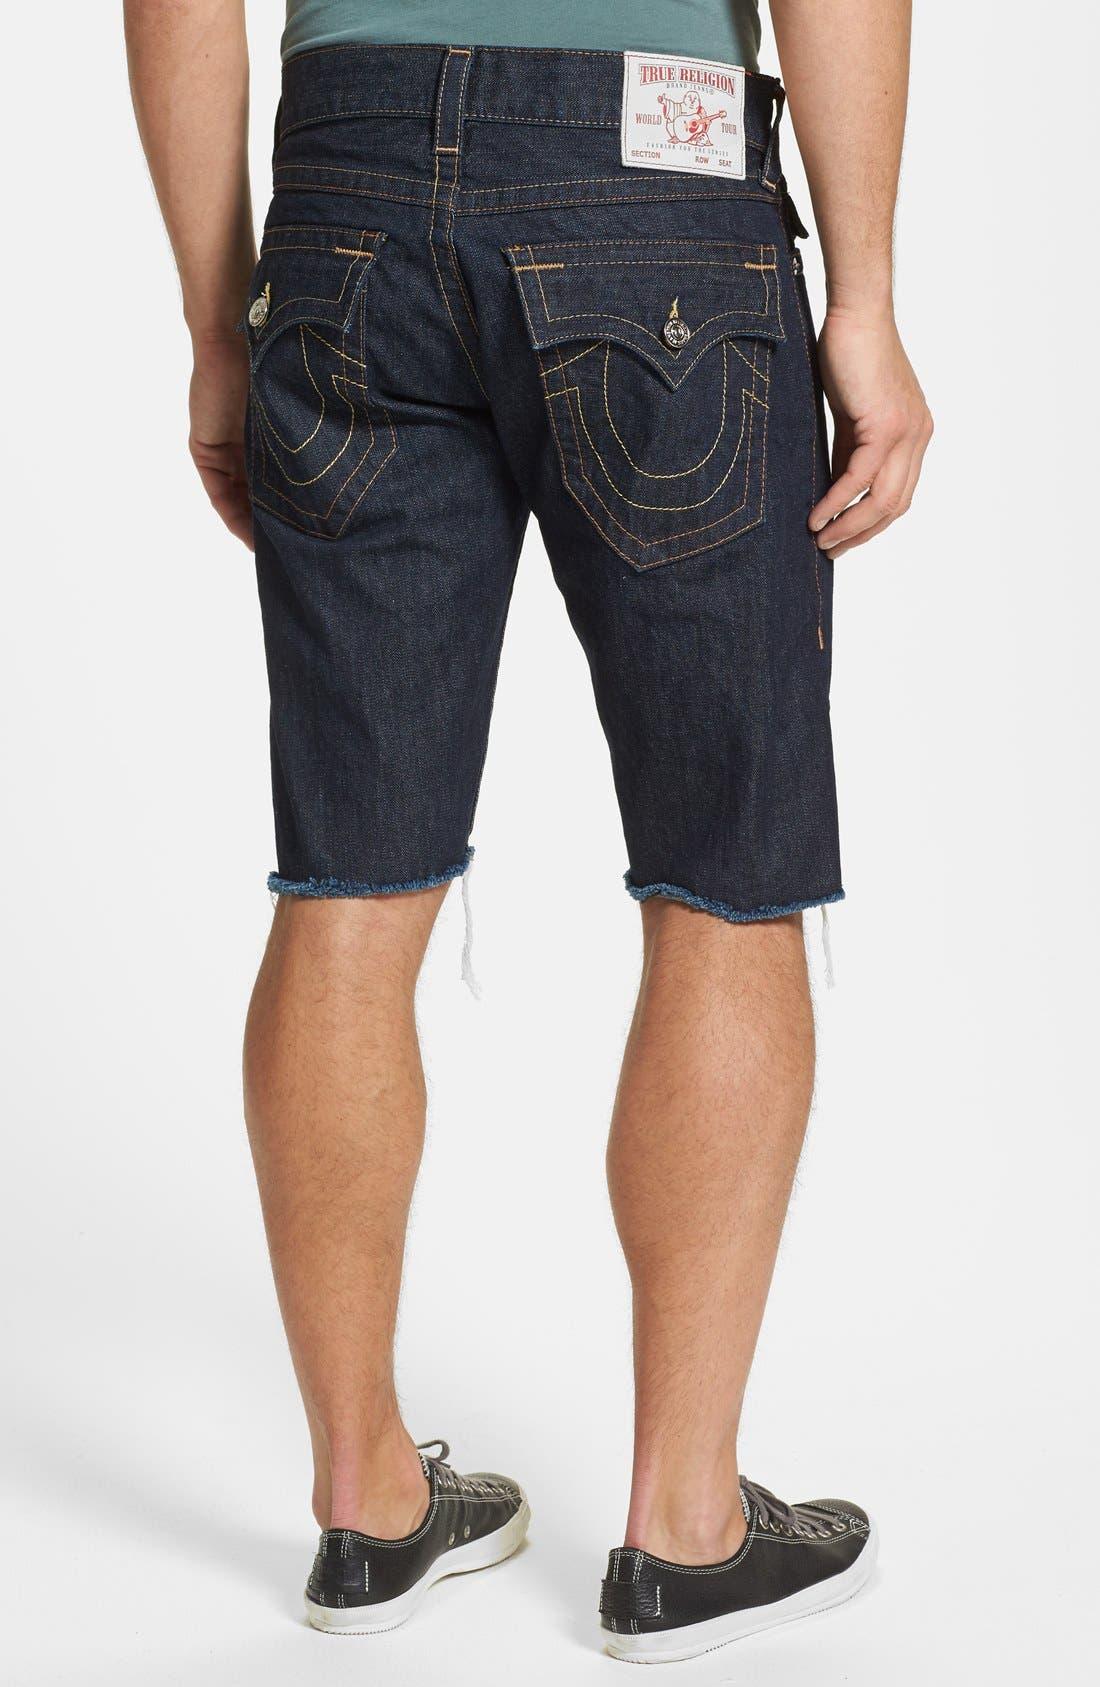 Main Image - True Religion Brand Jeans 'Ricky' Cut Off Denim Shorts